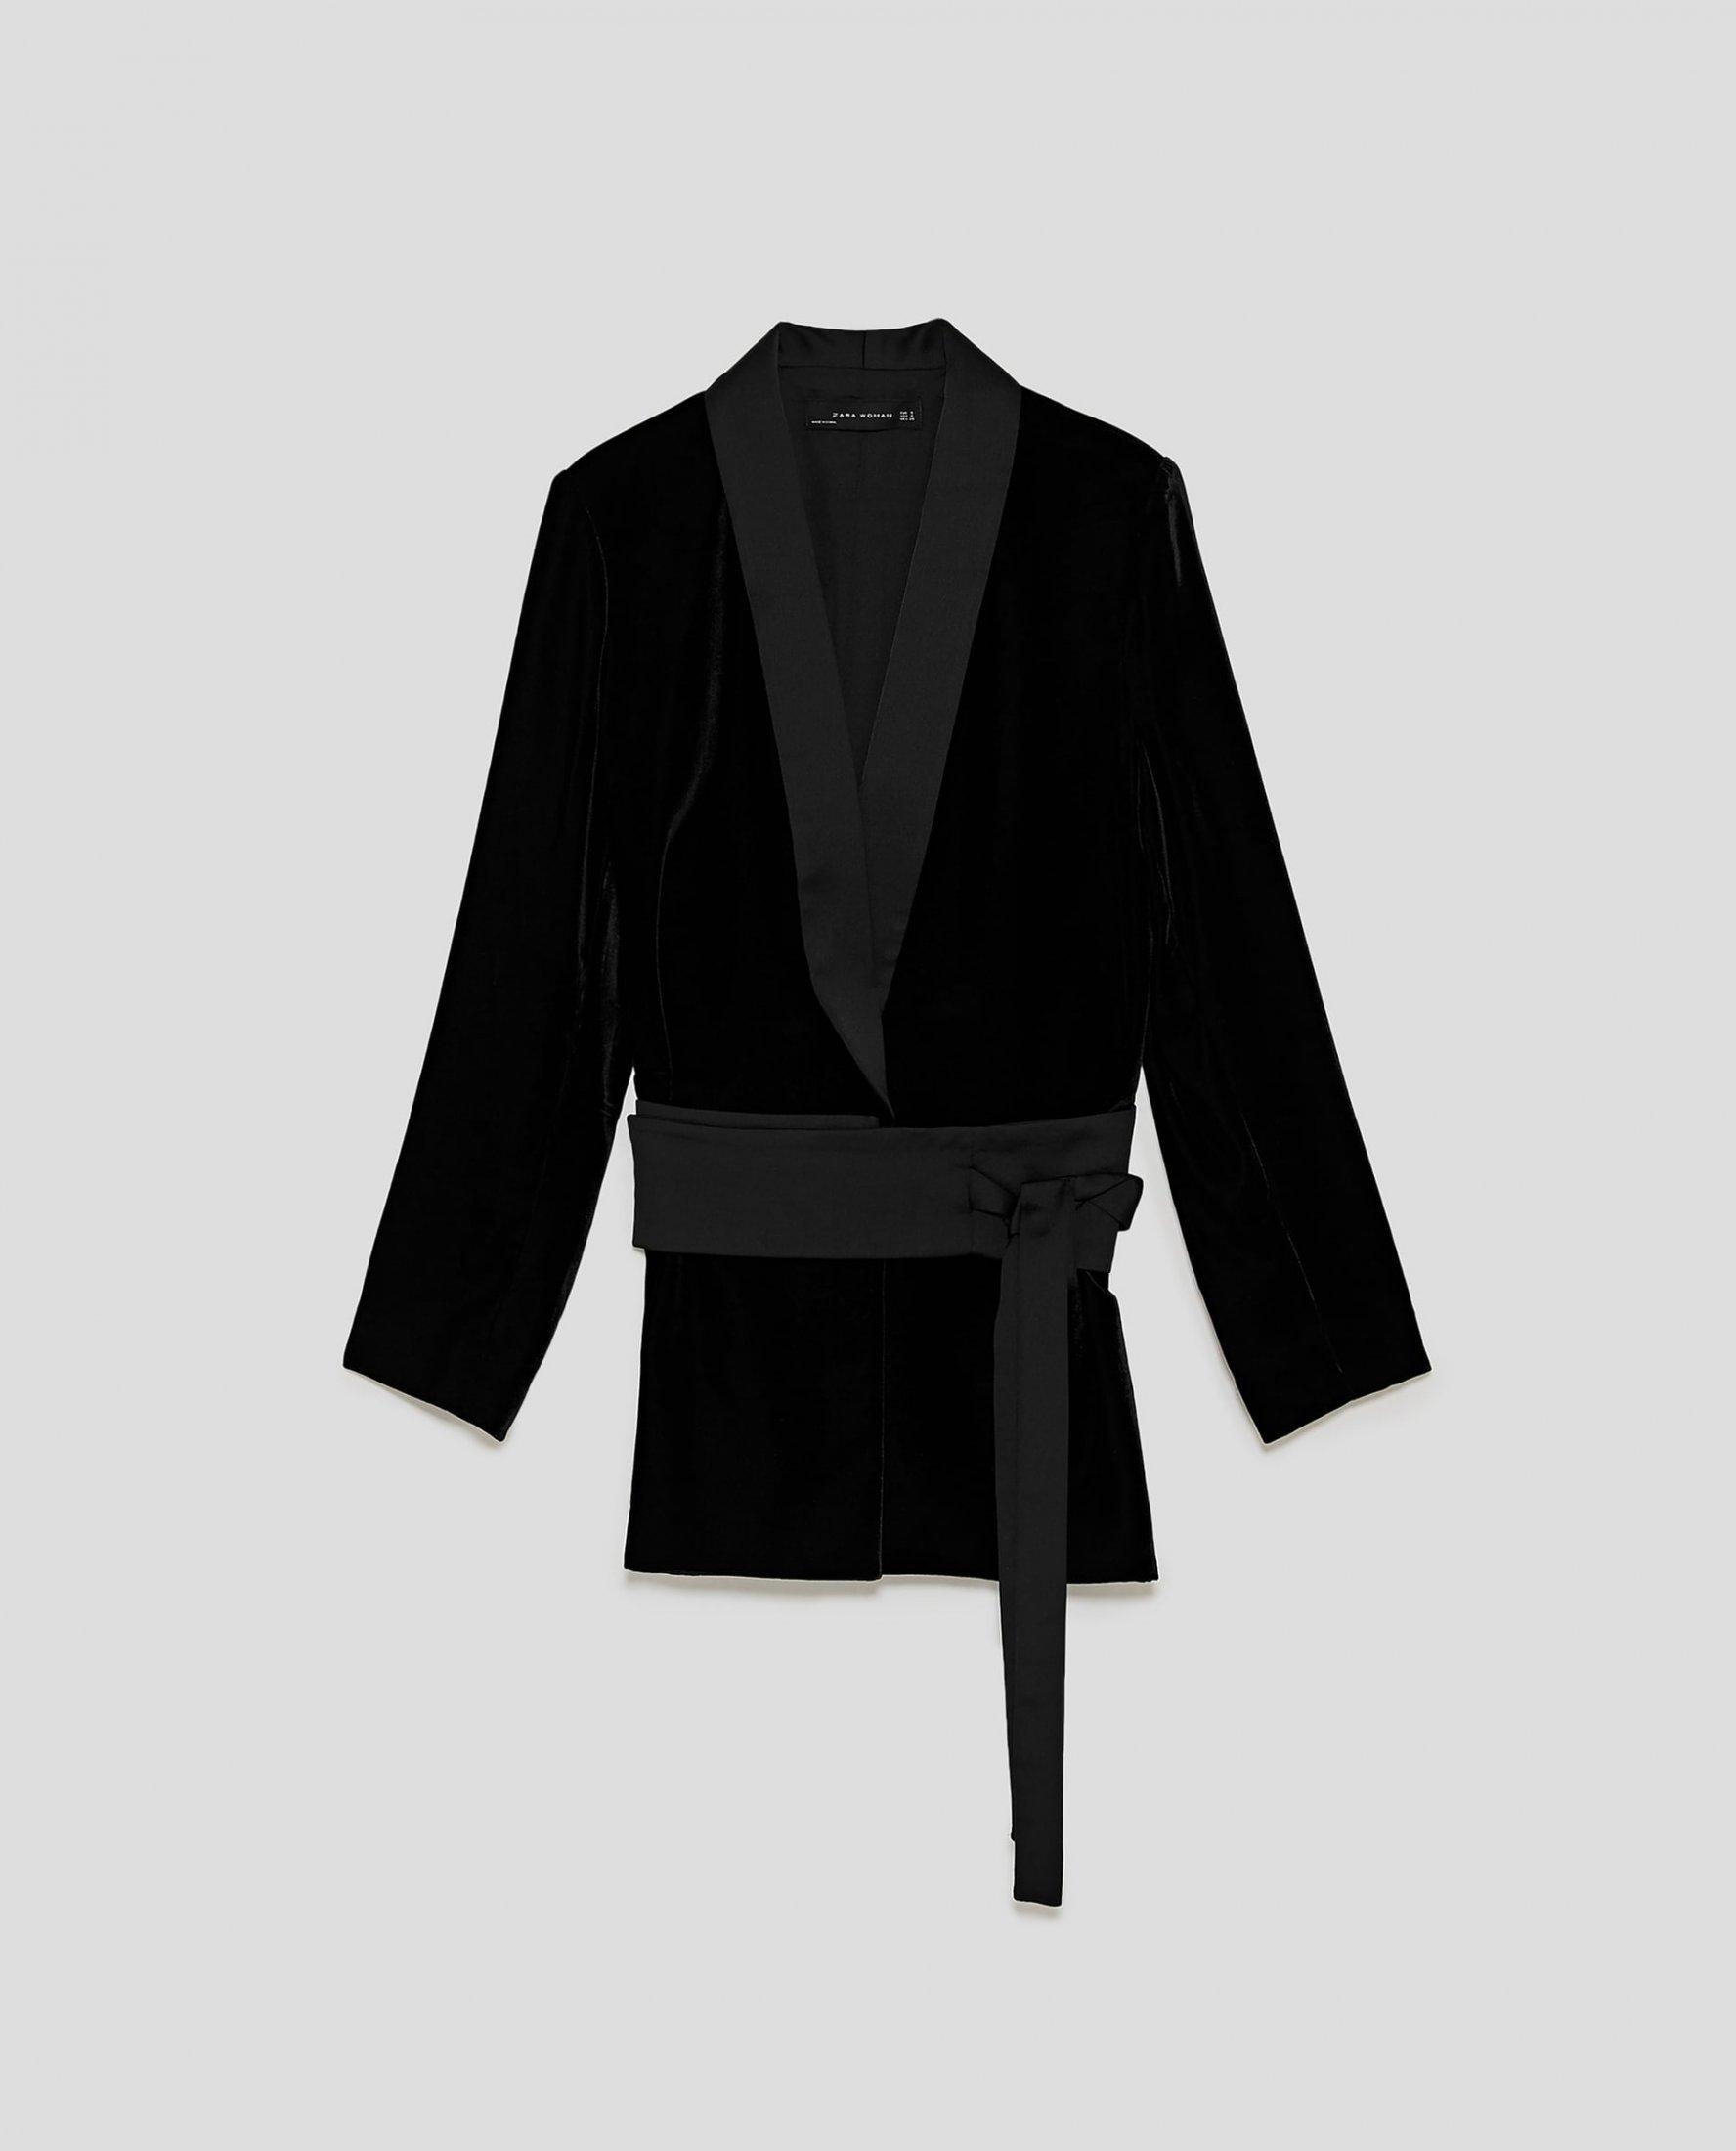 Velvet Jacket with Sash Belt £79.99